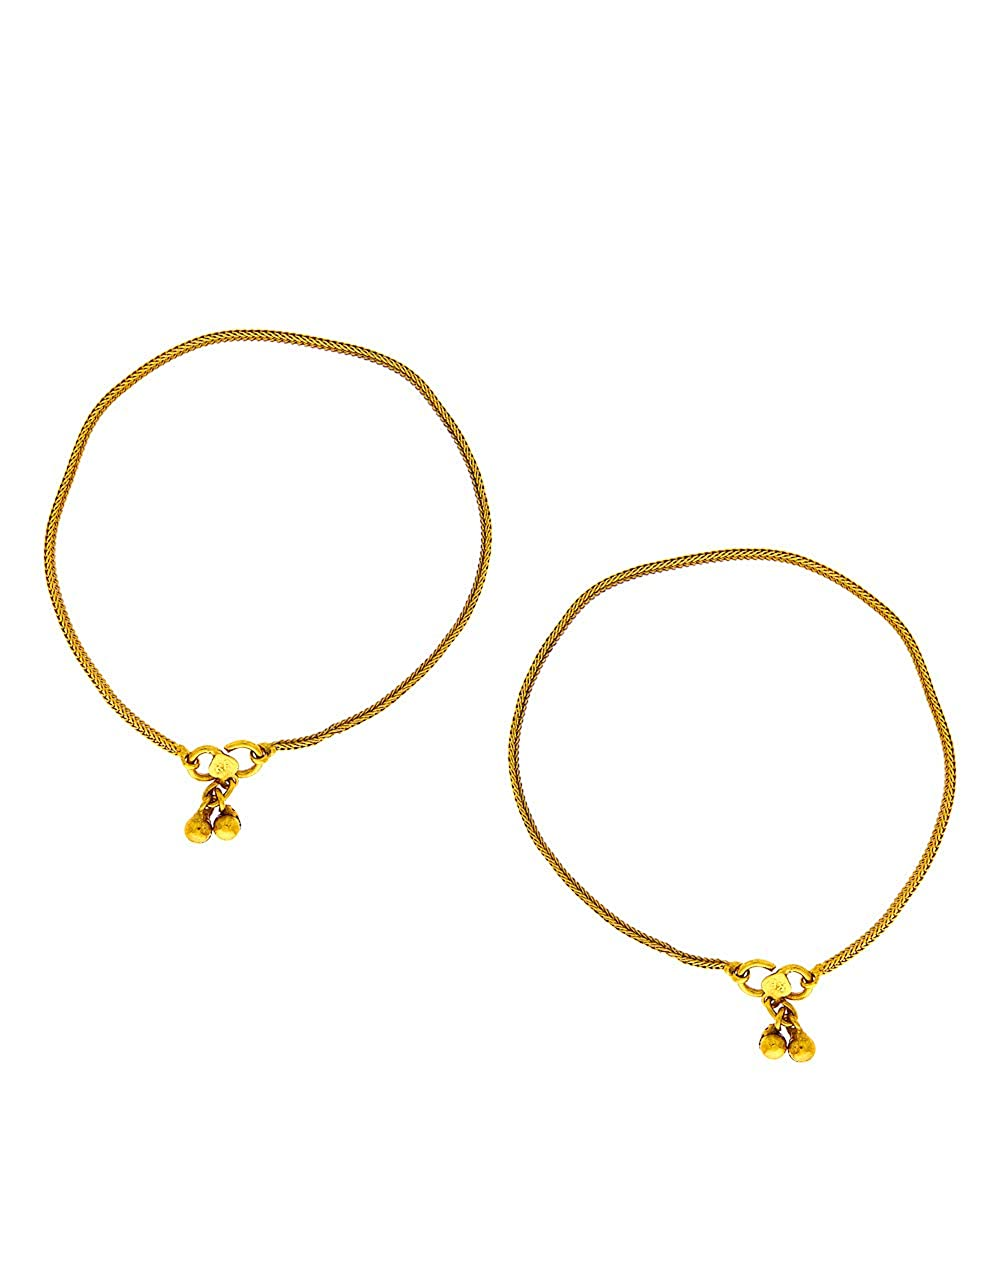 Anuradha Art Gold Tone Wonderful Classy Anklet//Payal for Women//Girls